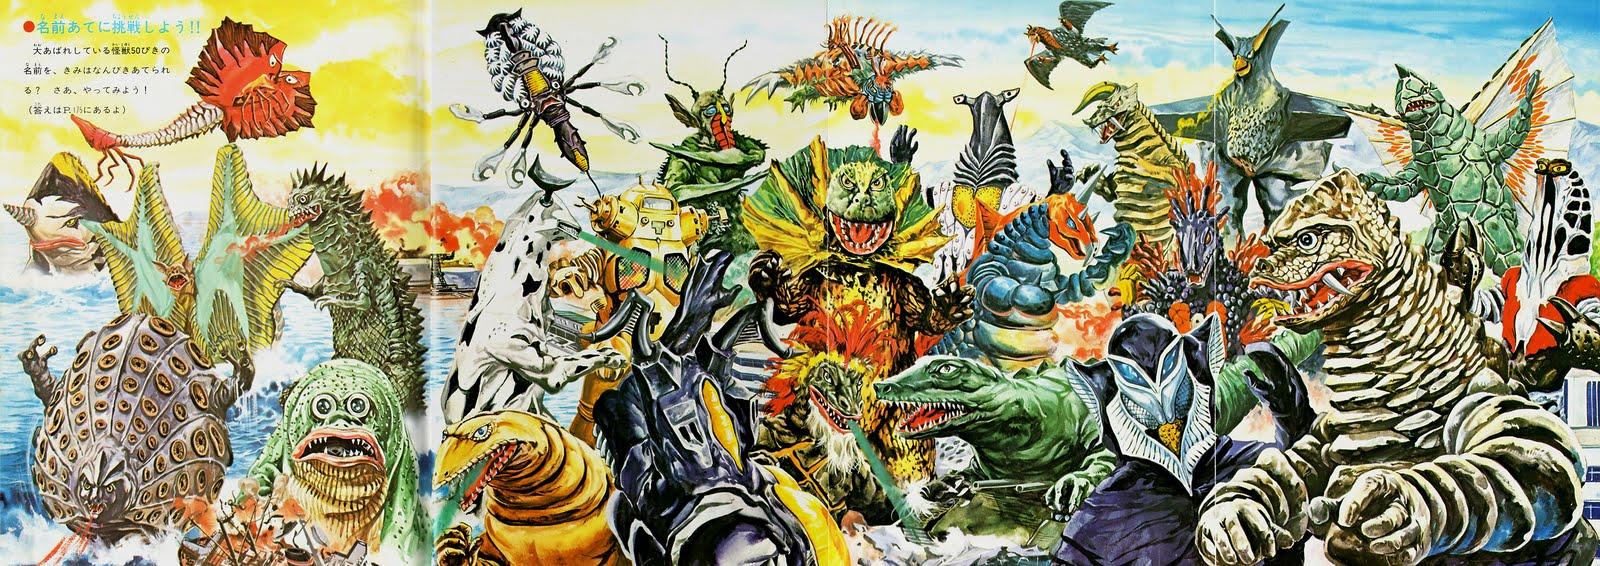 Vintage Ultraman Monster IllustrationUltraman Monsters List